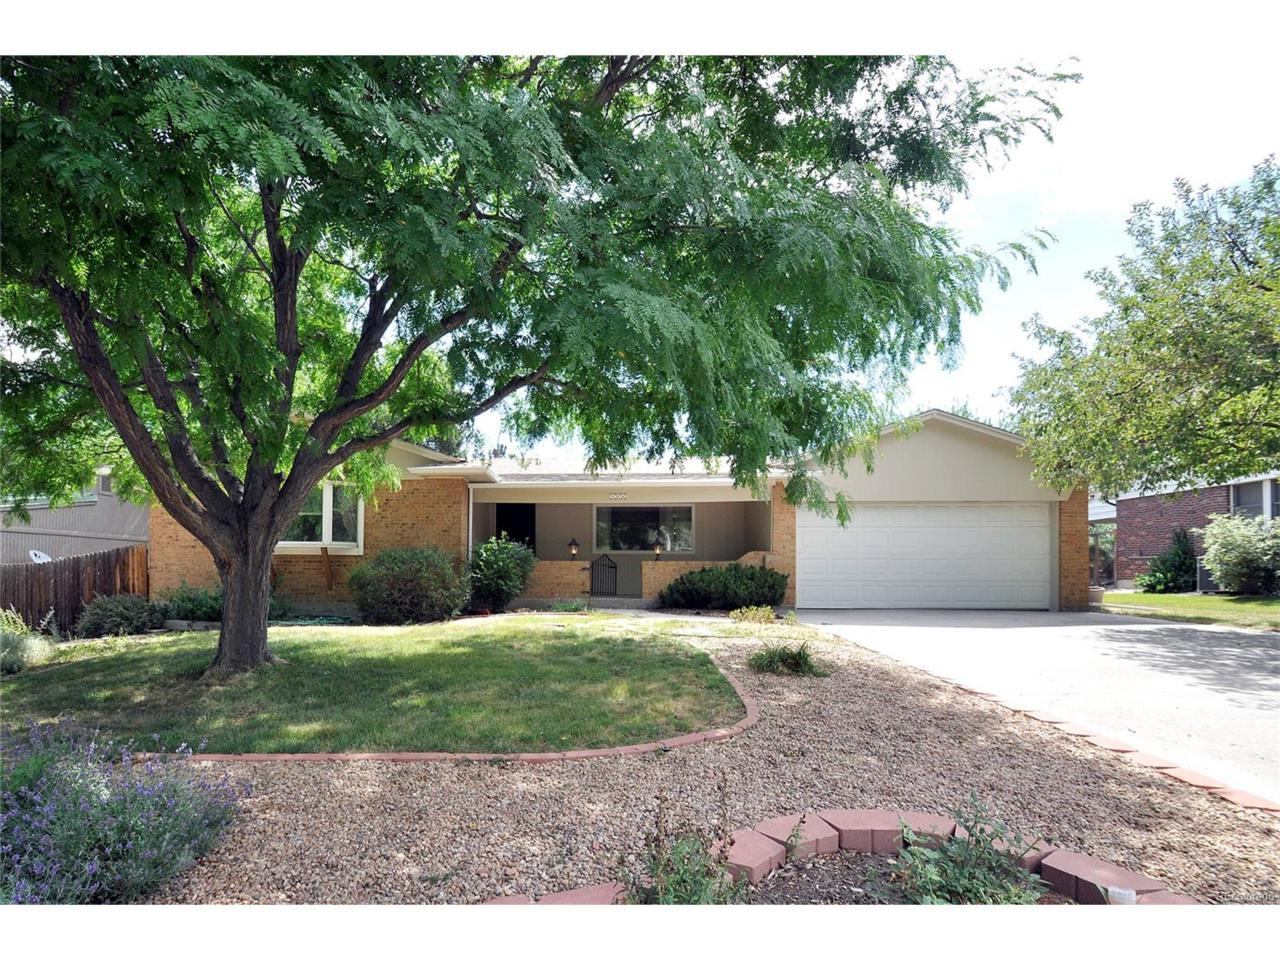 454 Flora Way, Golden, CO 80401 (MLS #1781989) :: 8z Real Estate